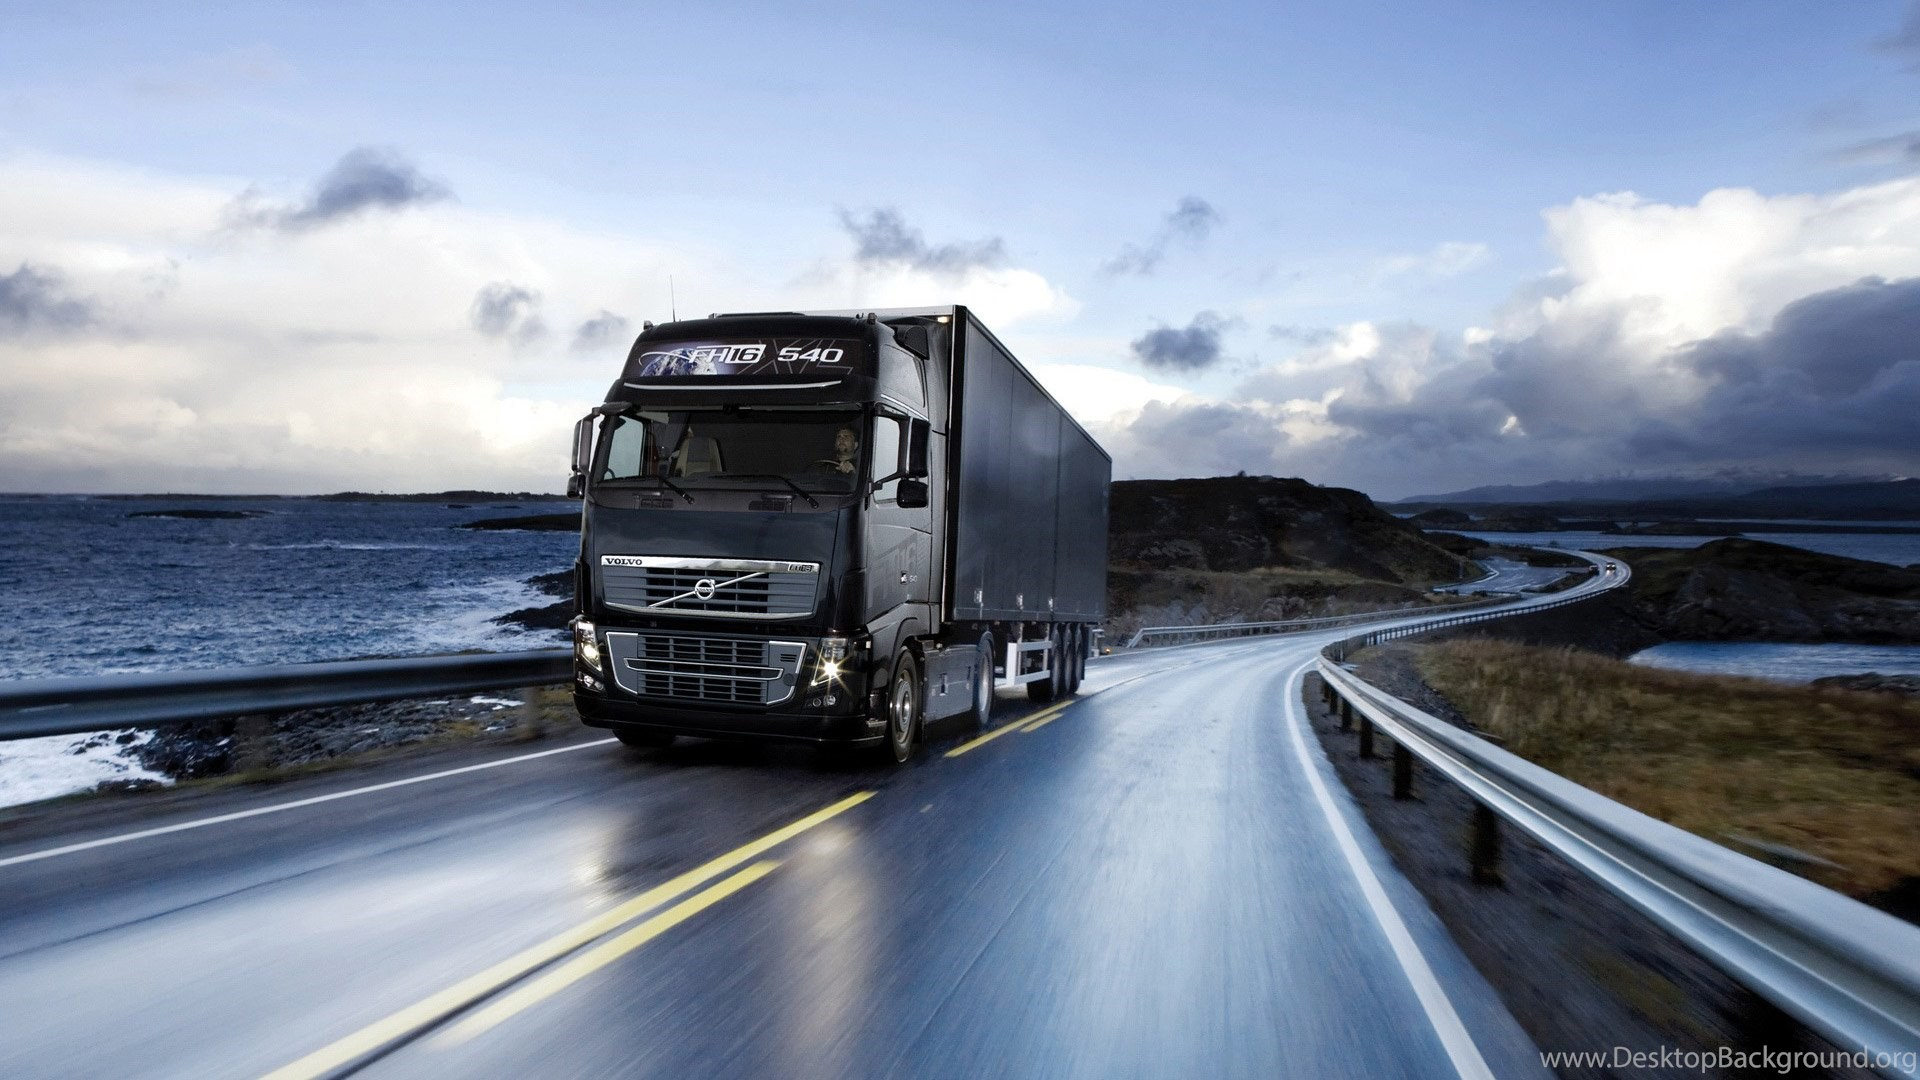 Volvo Truck Wallpapers Images Photos Pictures Pics Desktop